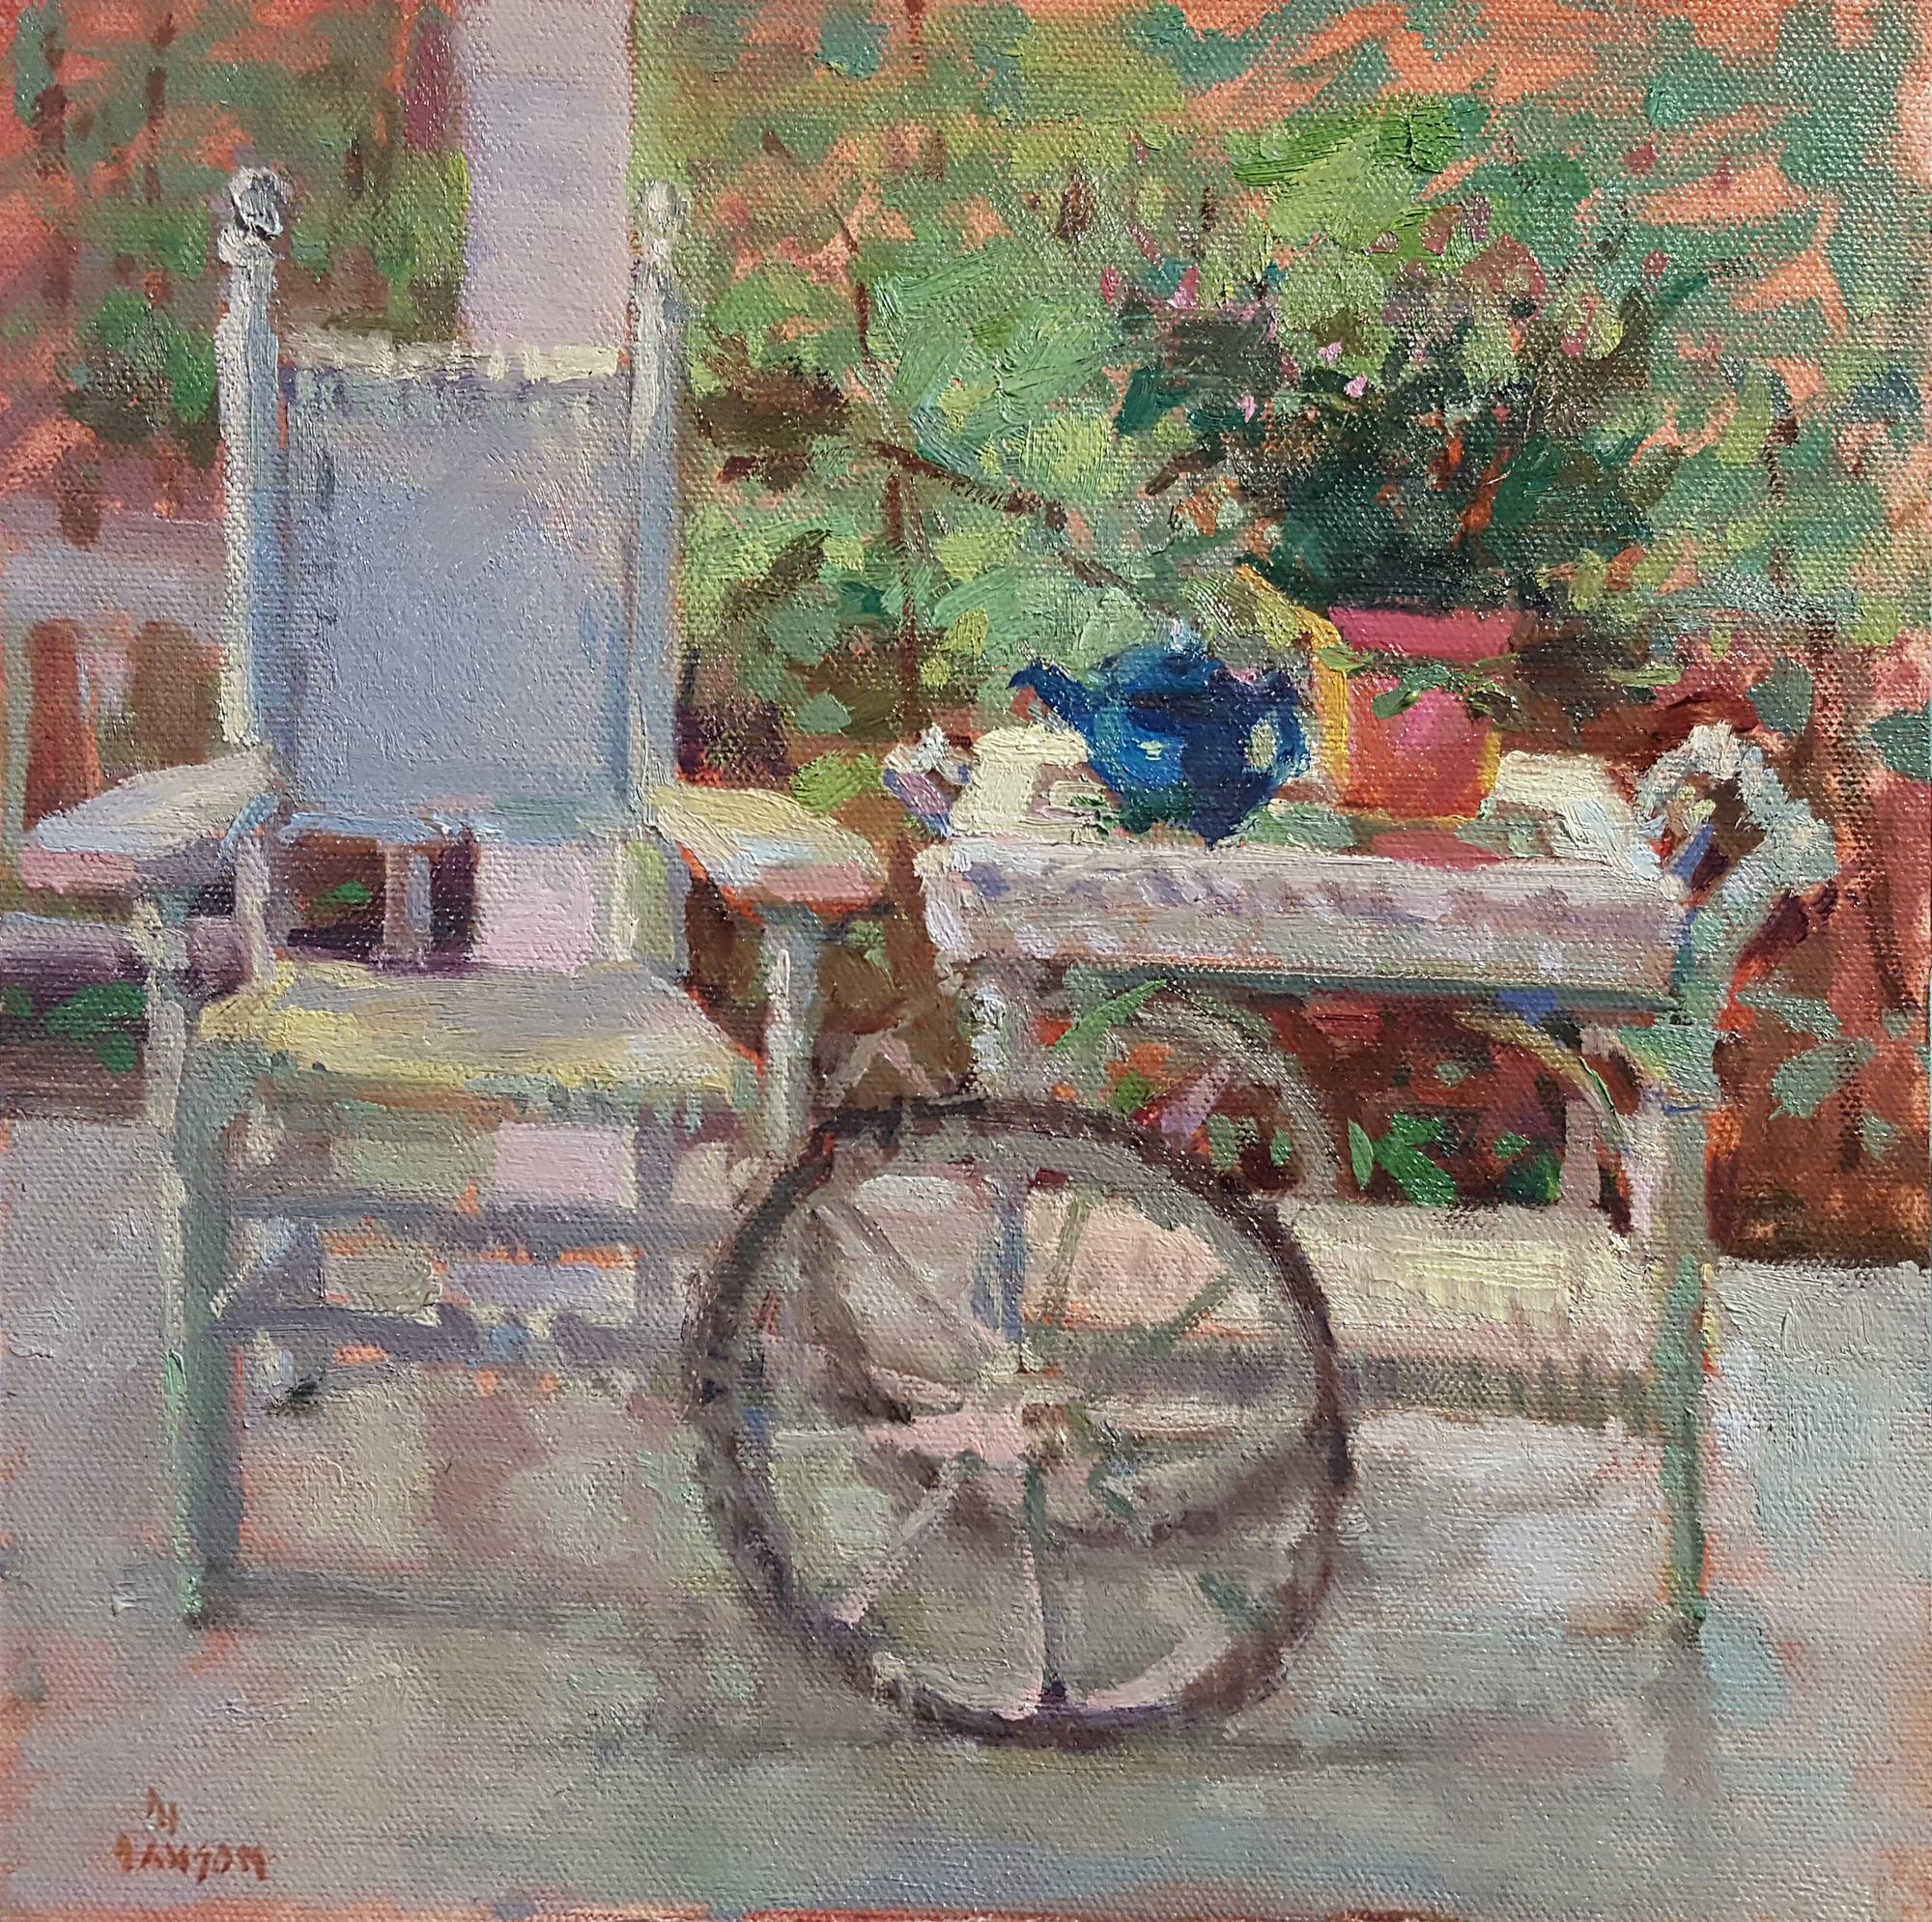 Oil Painters of America 2015 Eastern Regional Exhibition